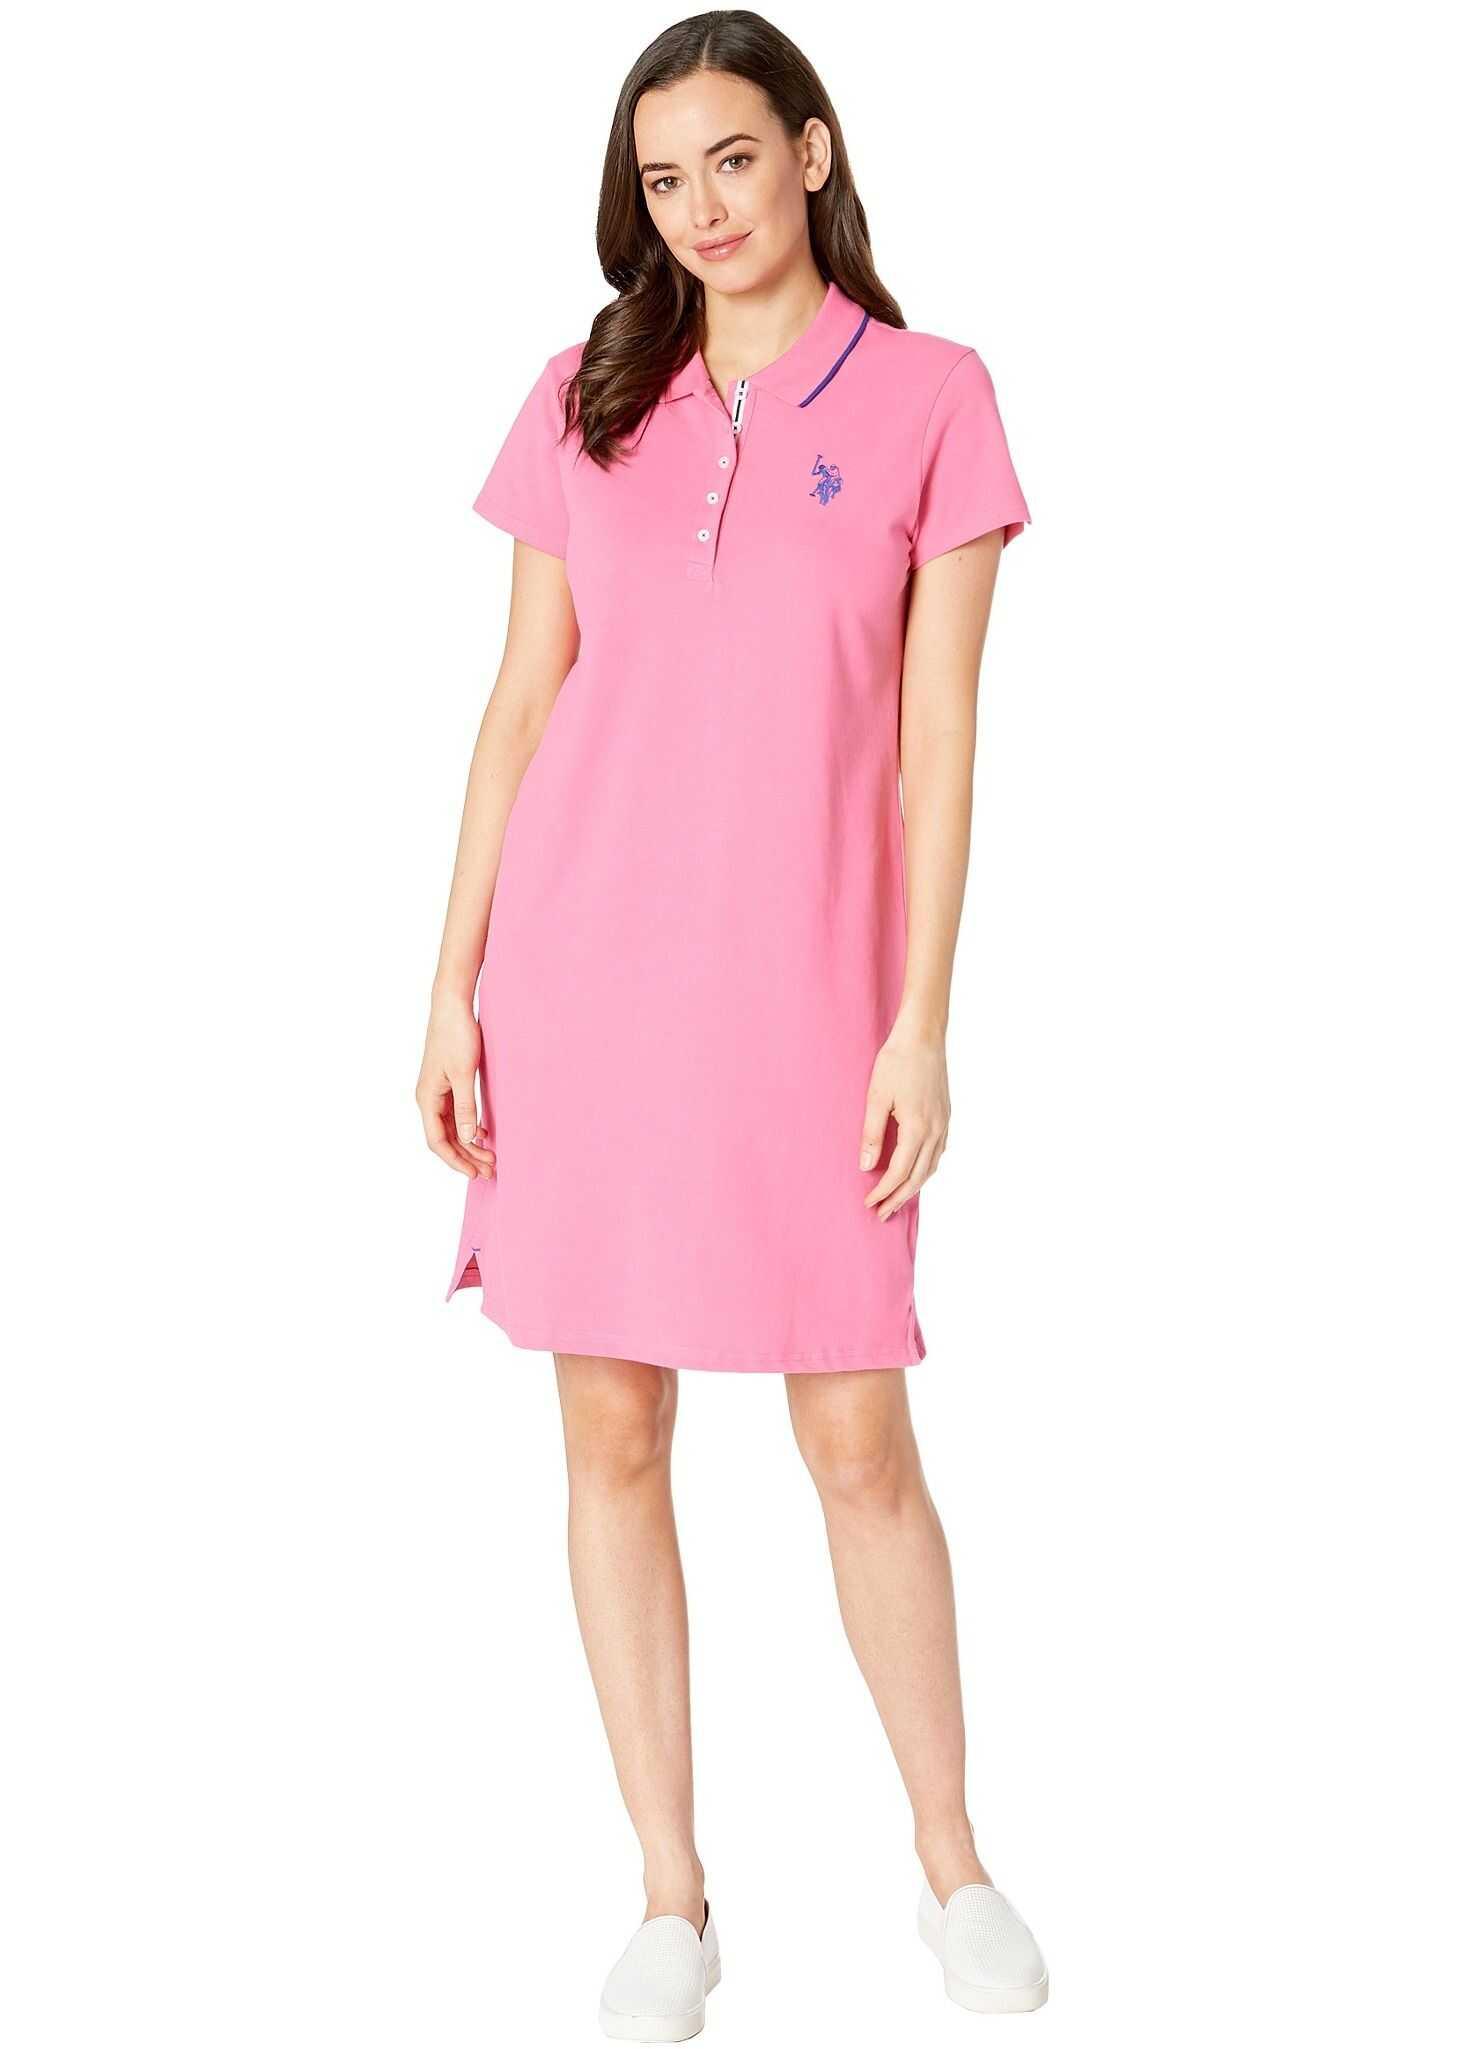 U.S. POLO ASSN. Plain Polo Dress Pink Plumeria